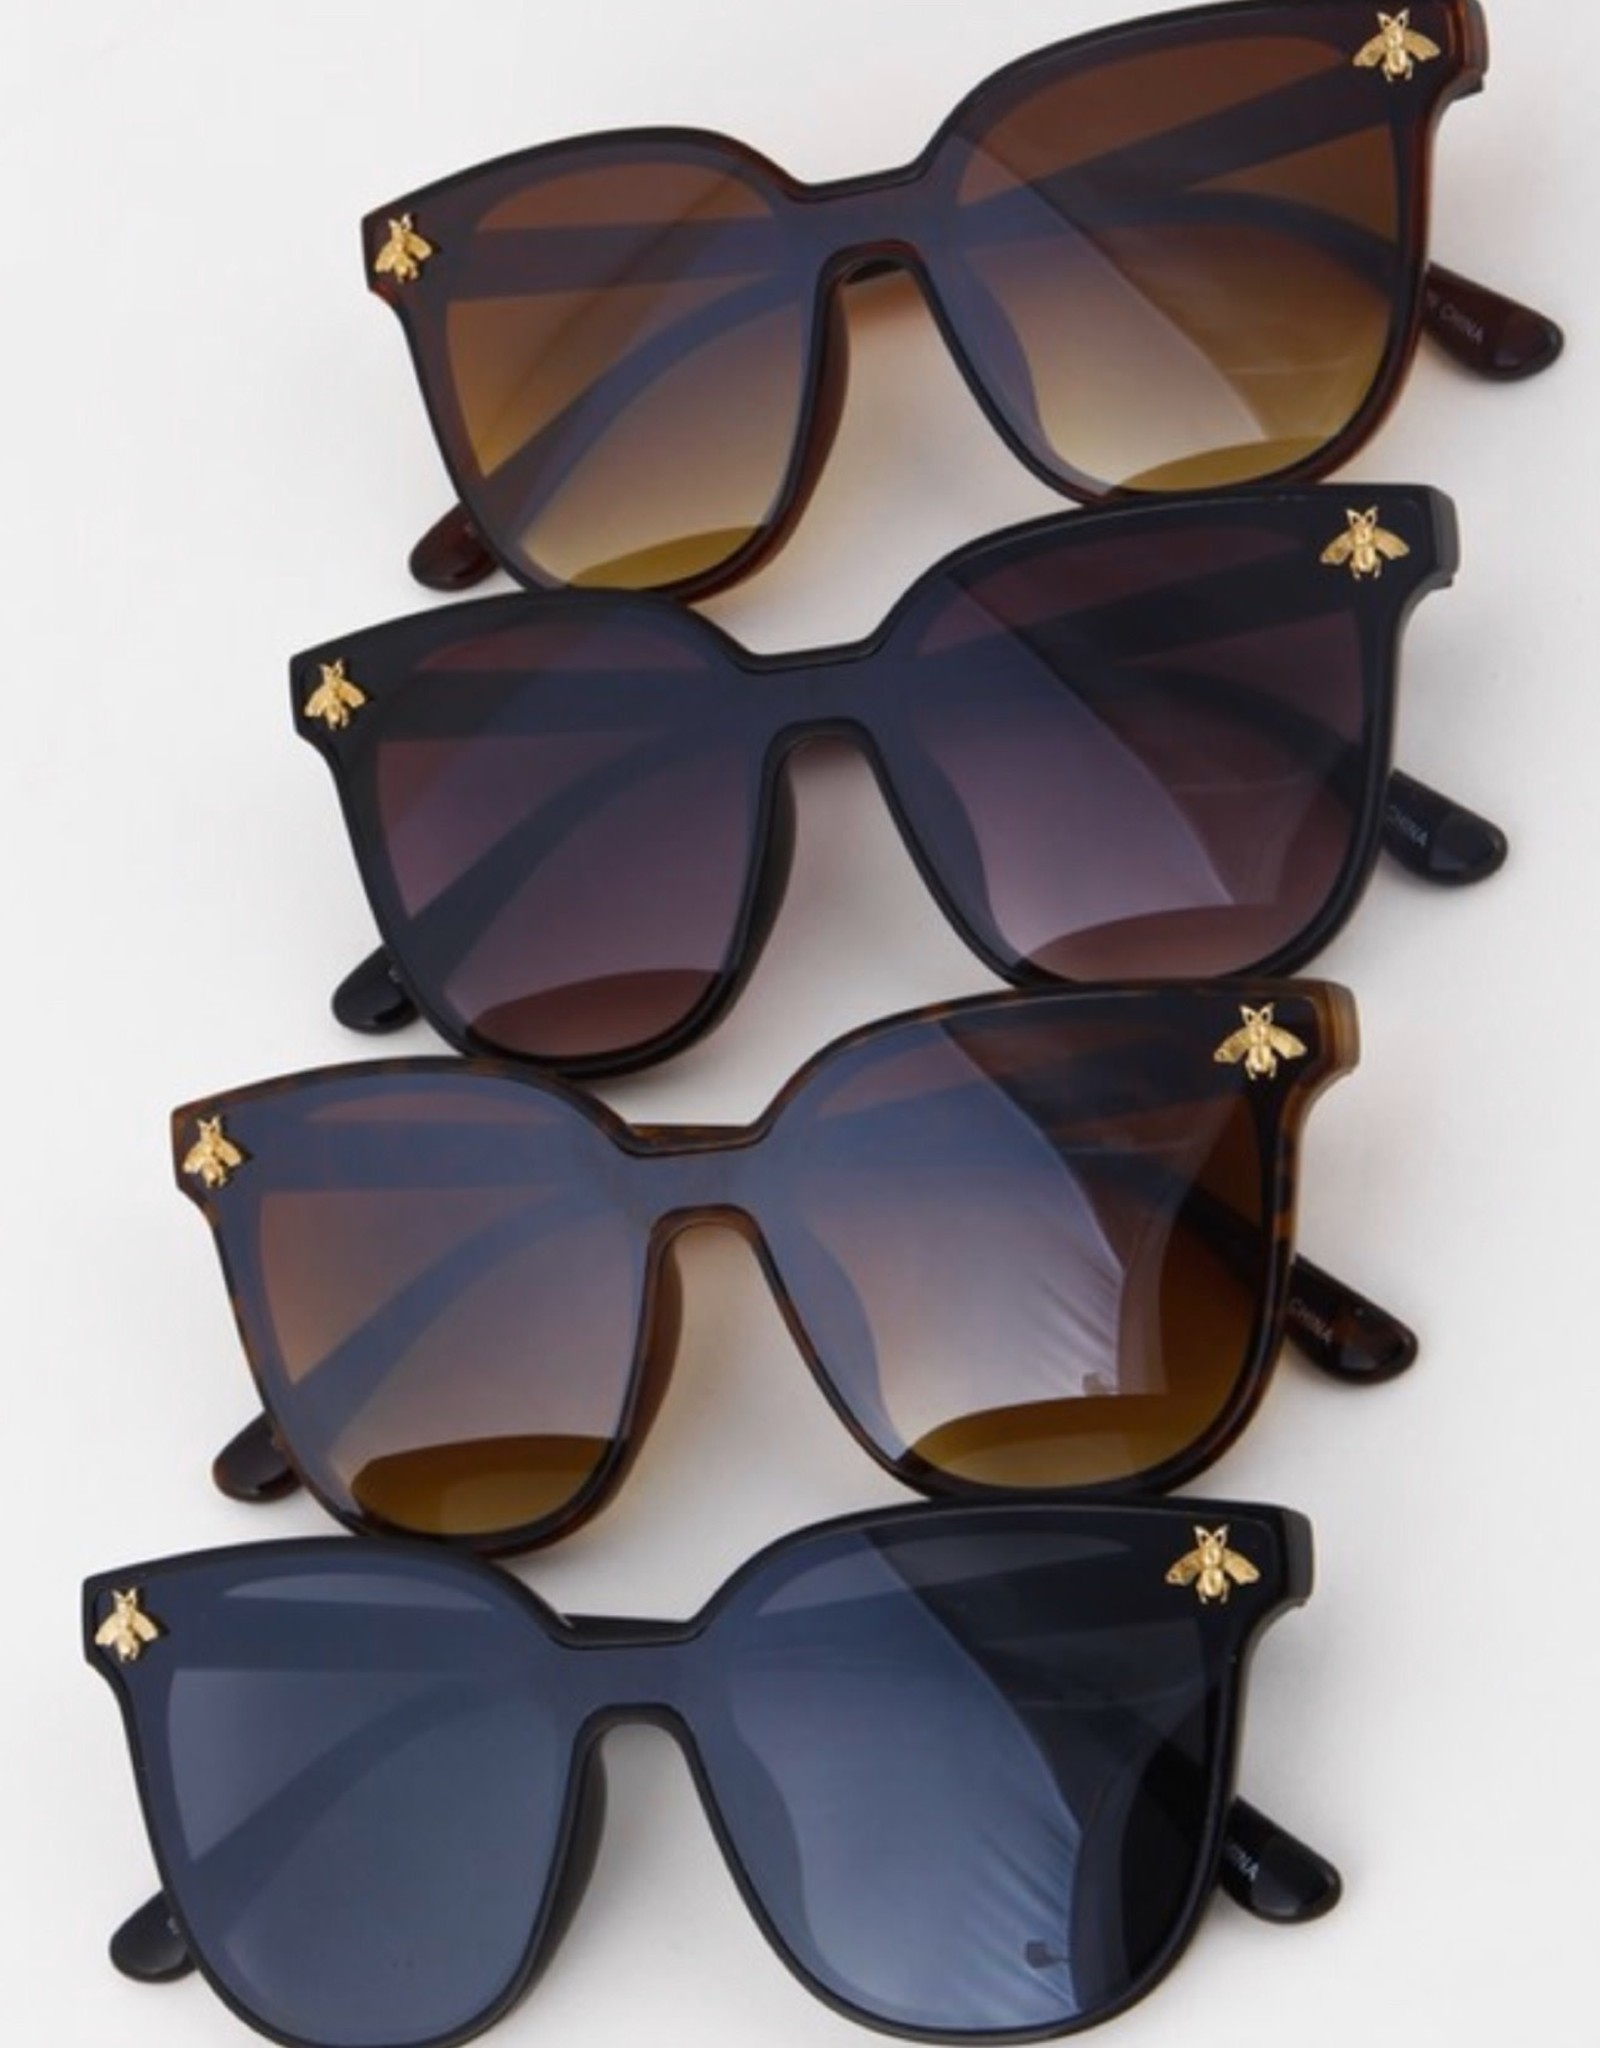 Sunglasses Butterfly studded Sunglasses